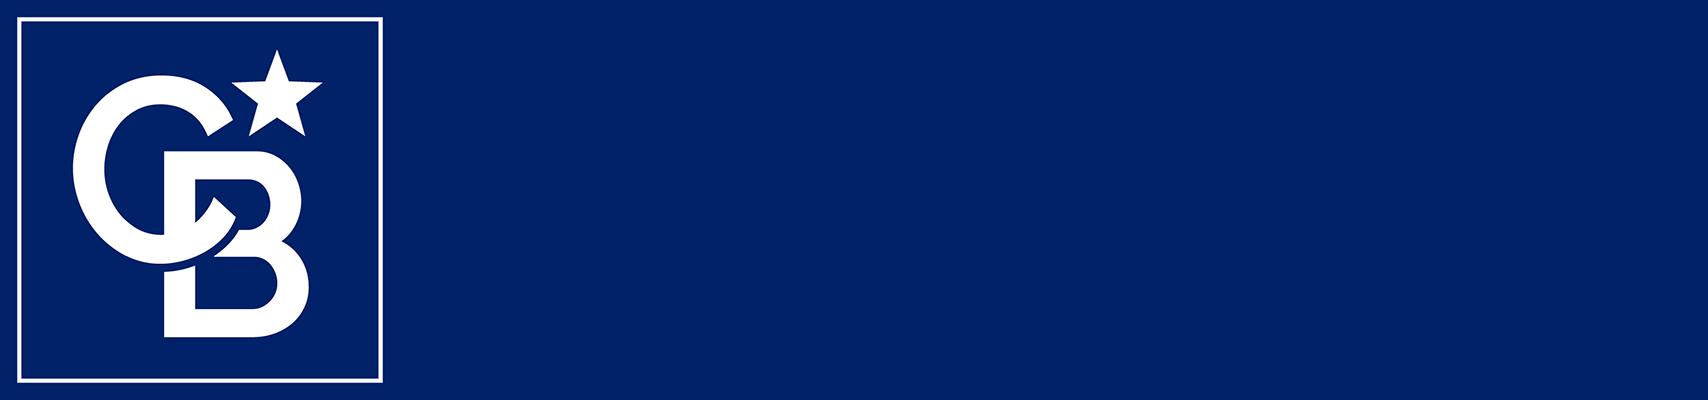 Trish Allison - Coldwell Banker Select Logo